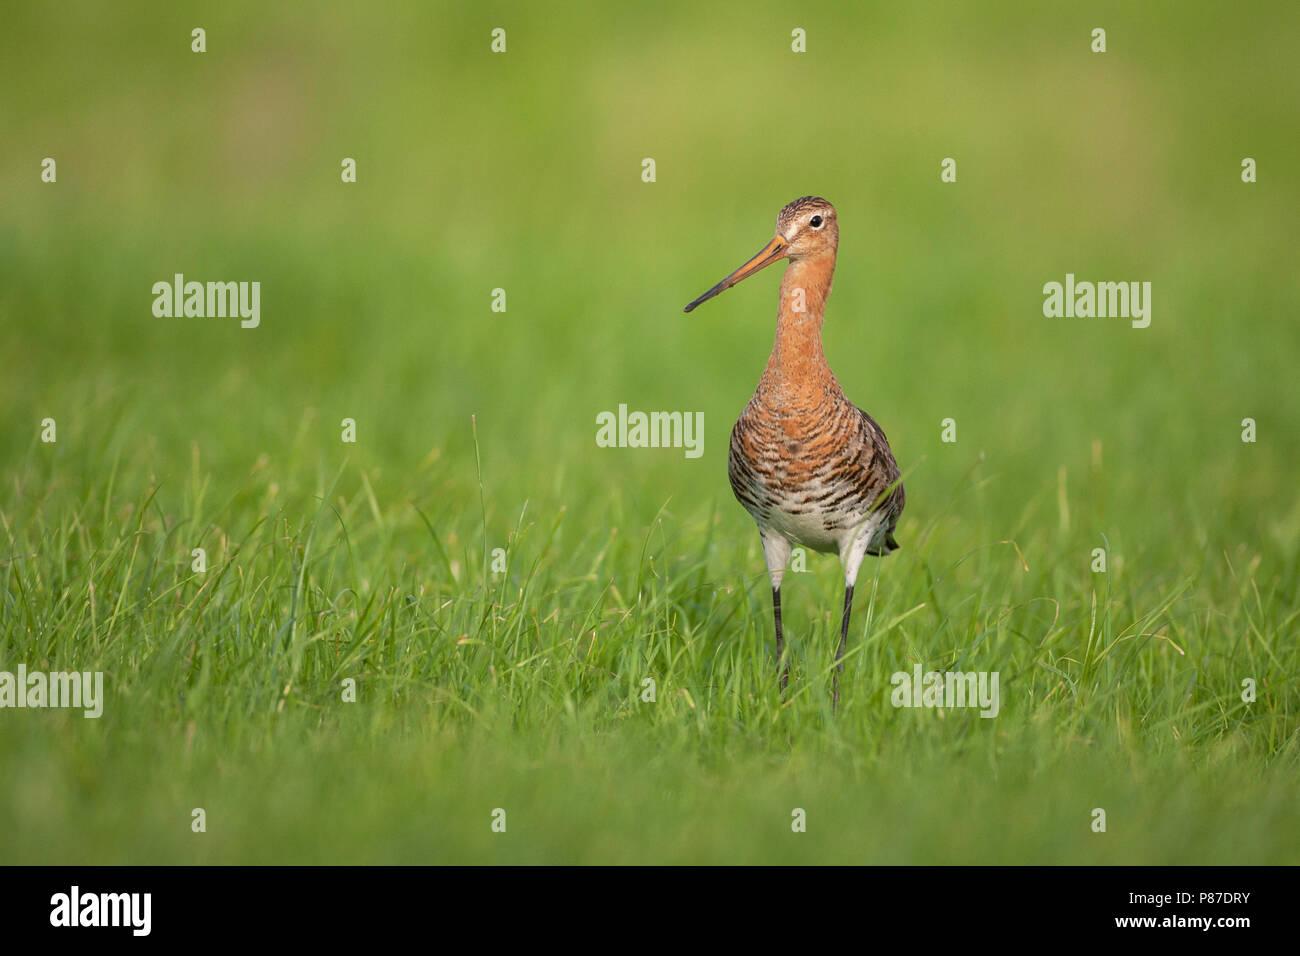 Grutto, Black-tailed Godwit, Limosa limosa Stock Photo